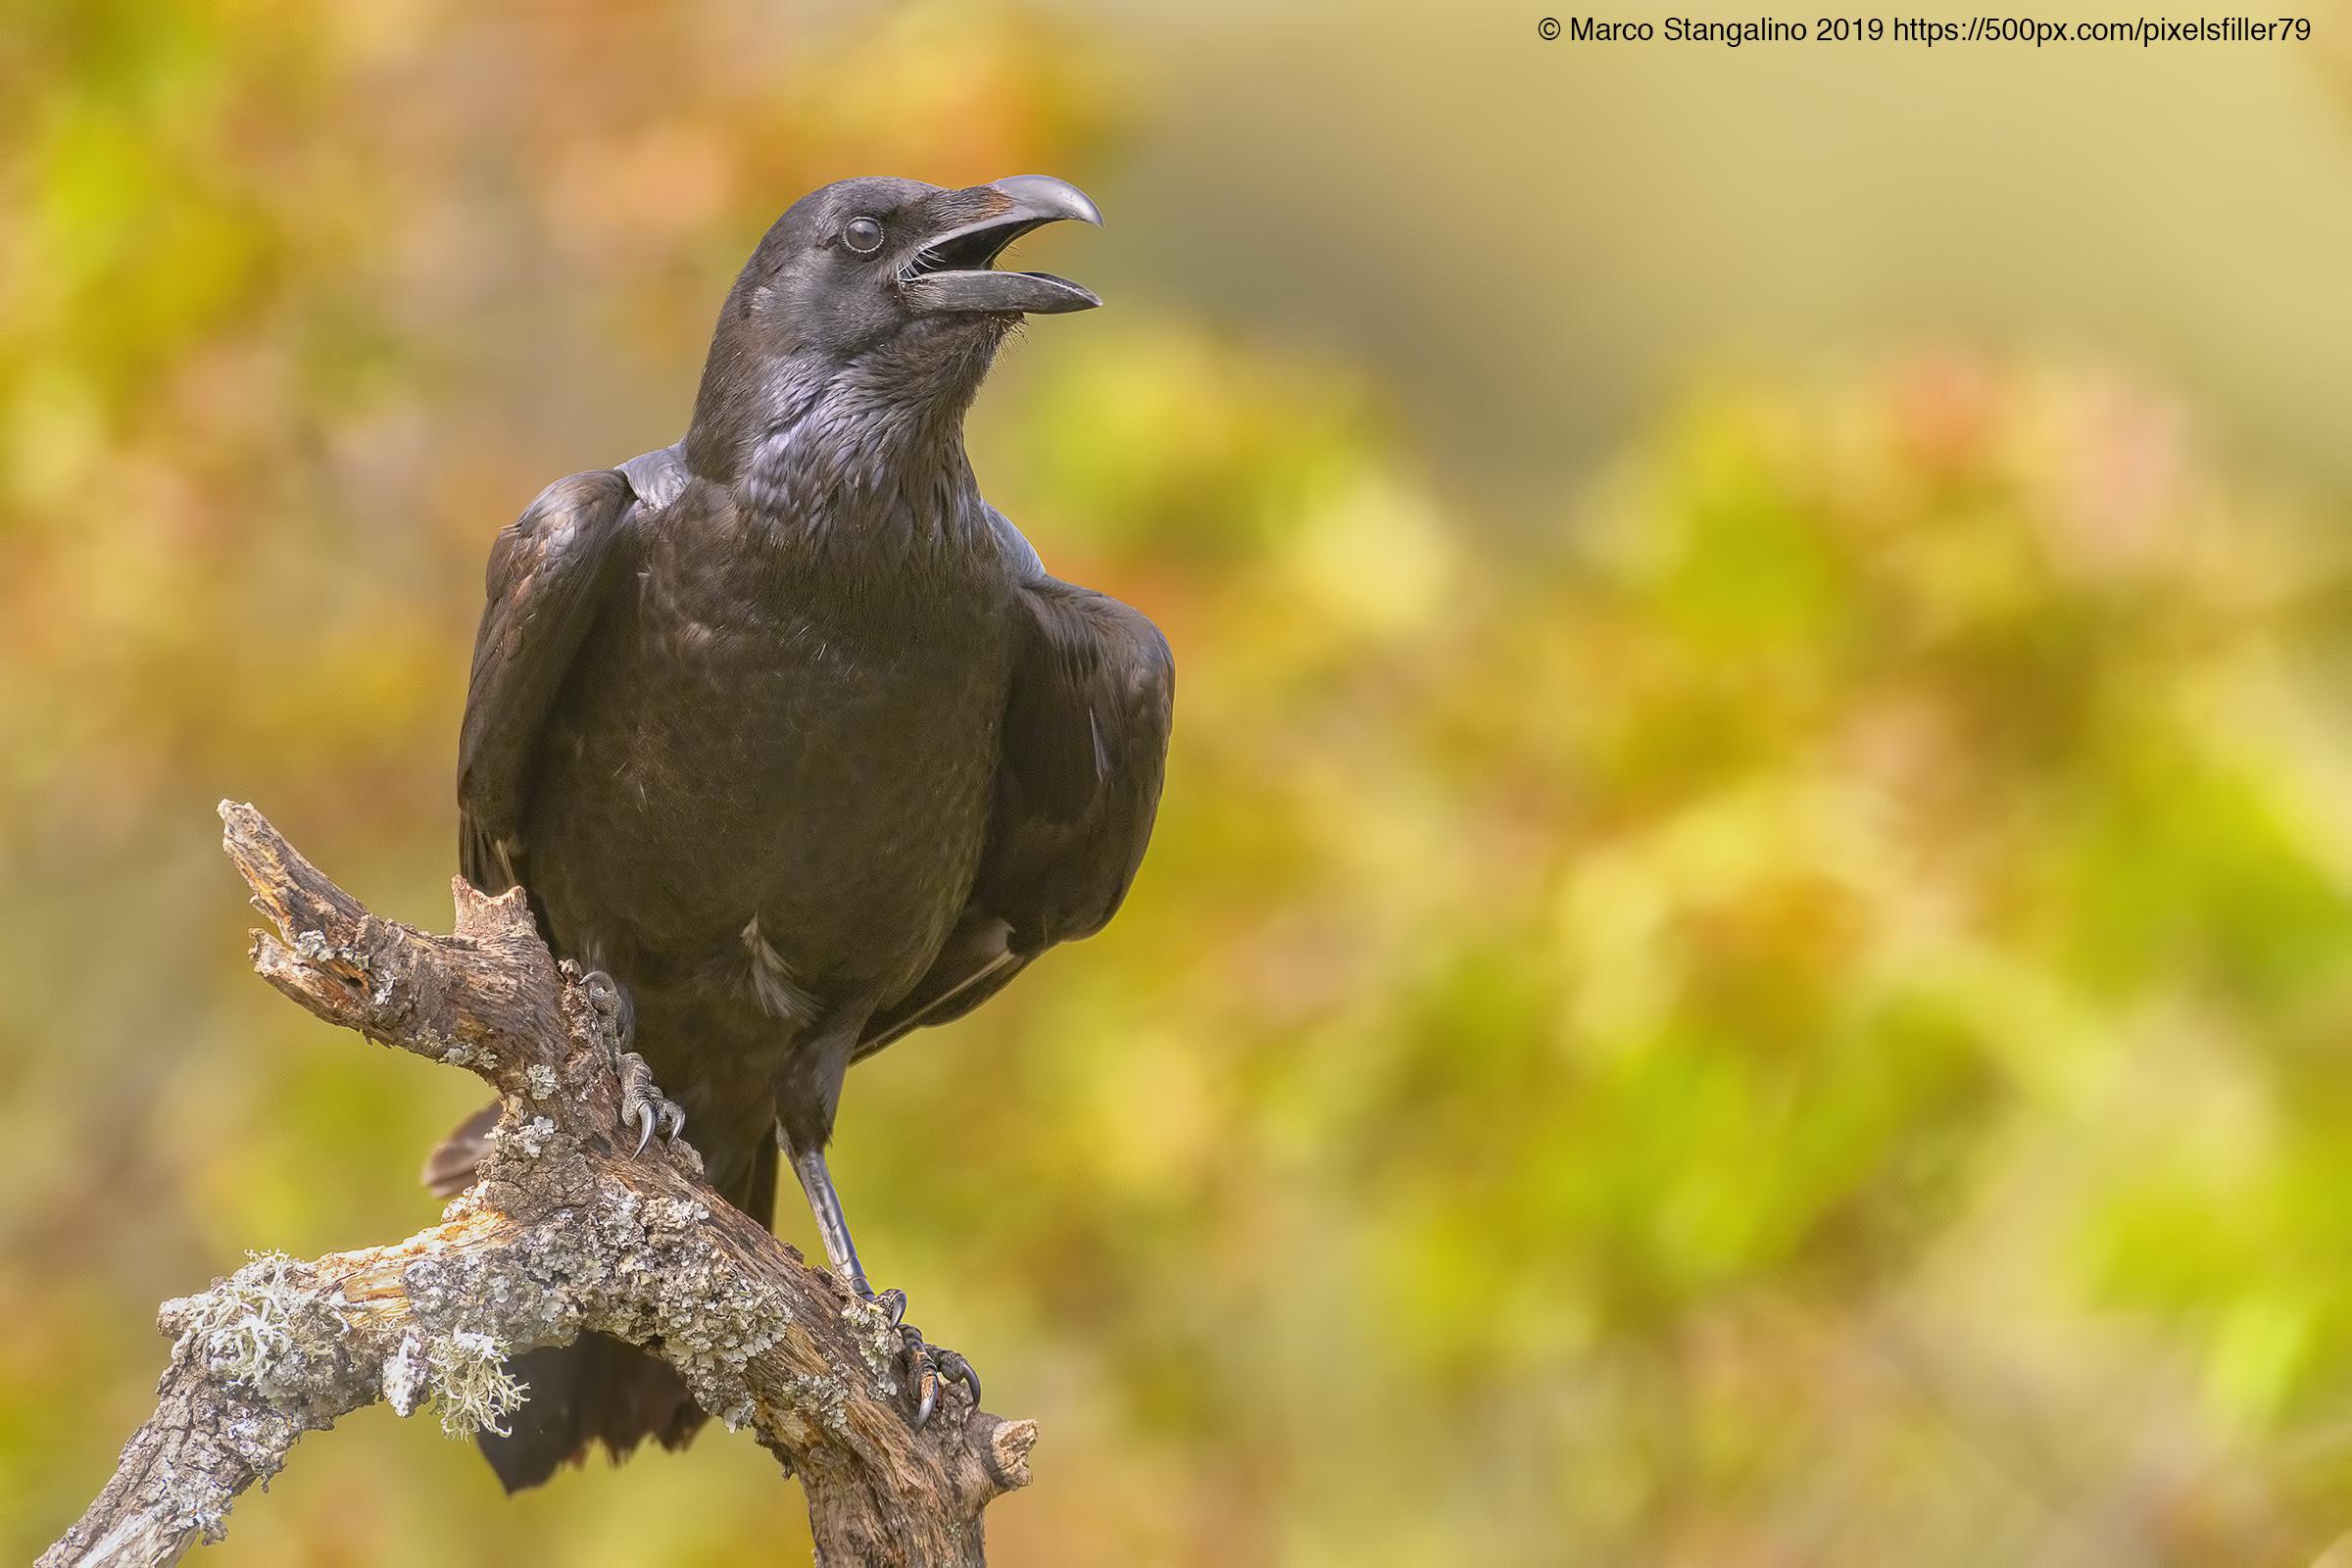 Shouting Crow...